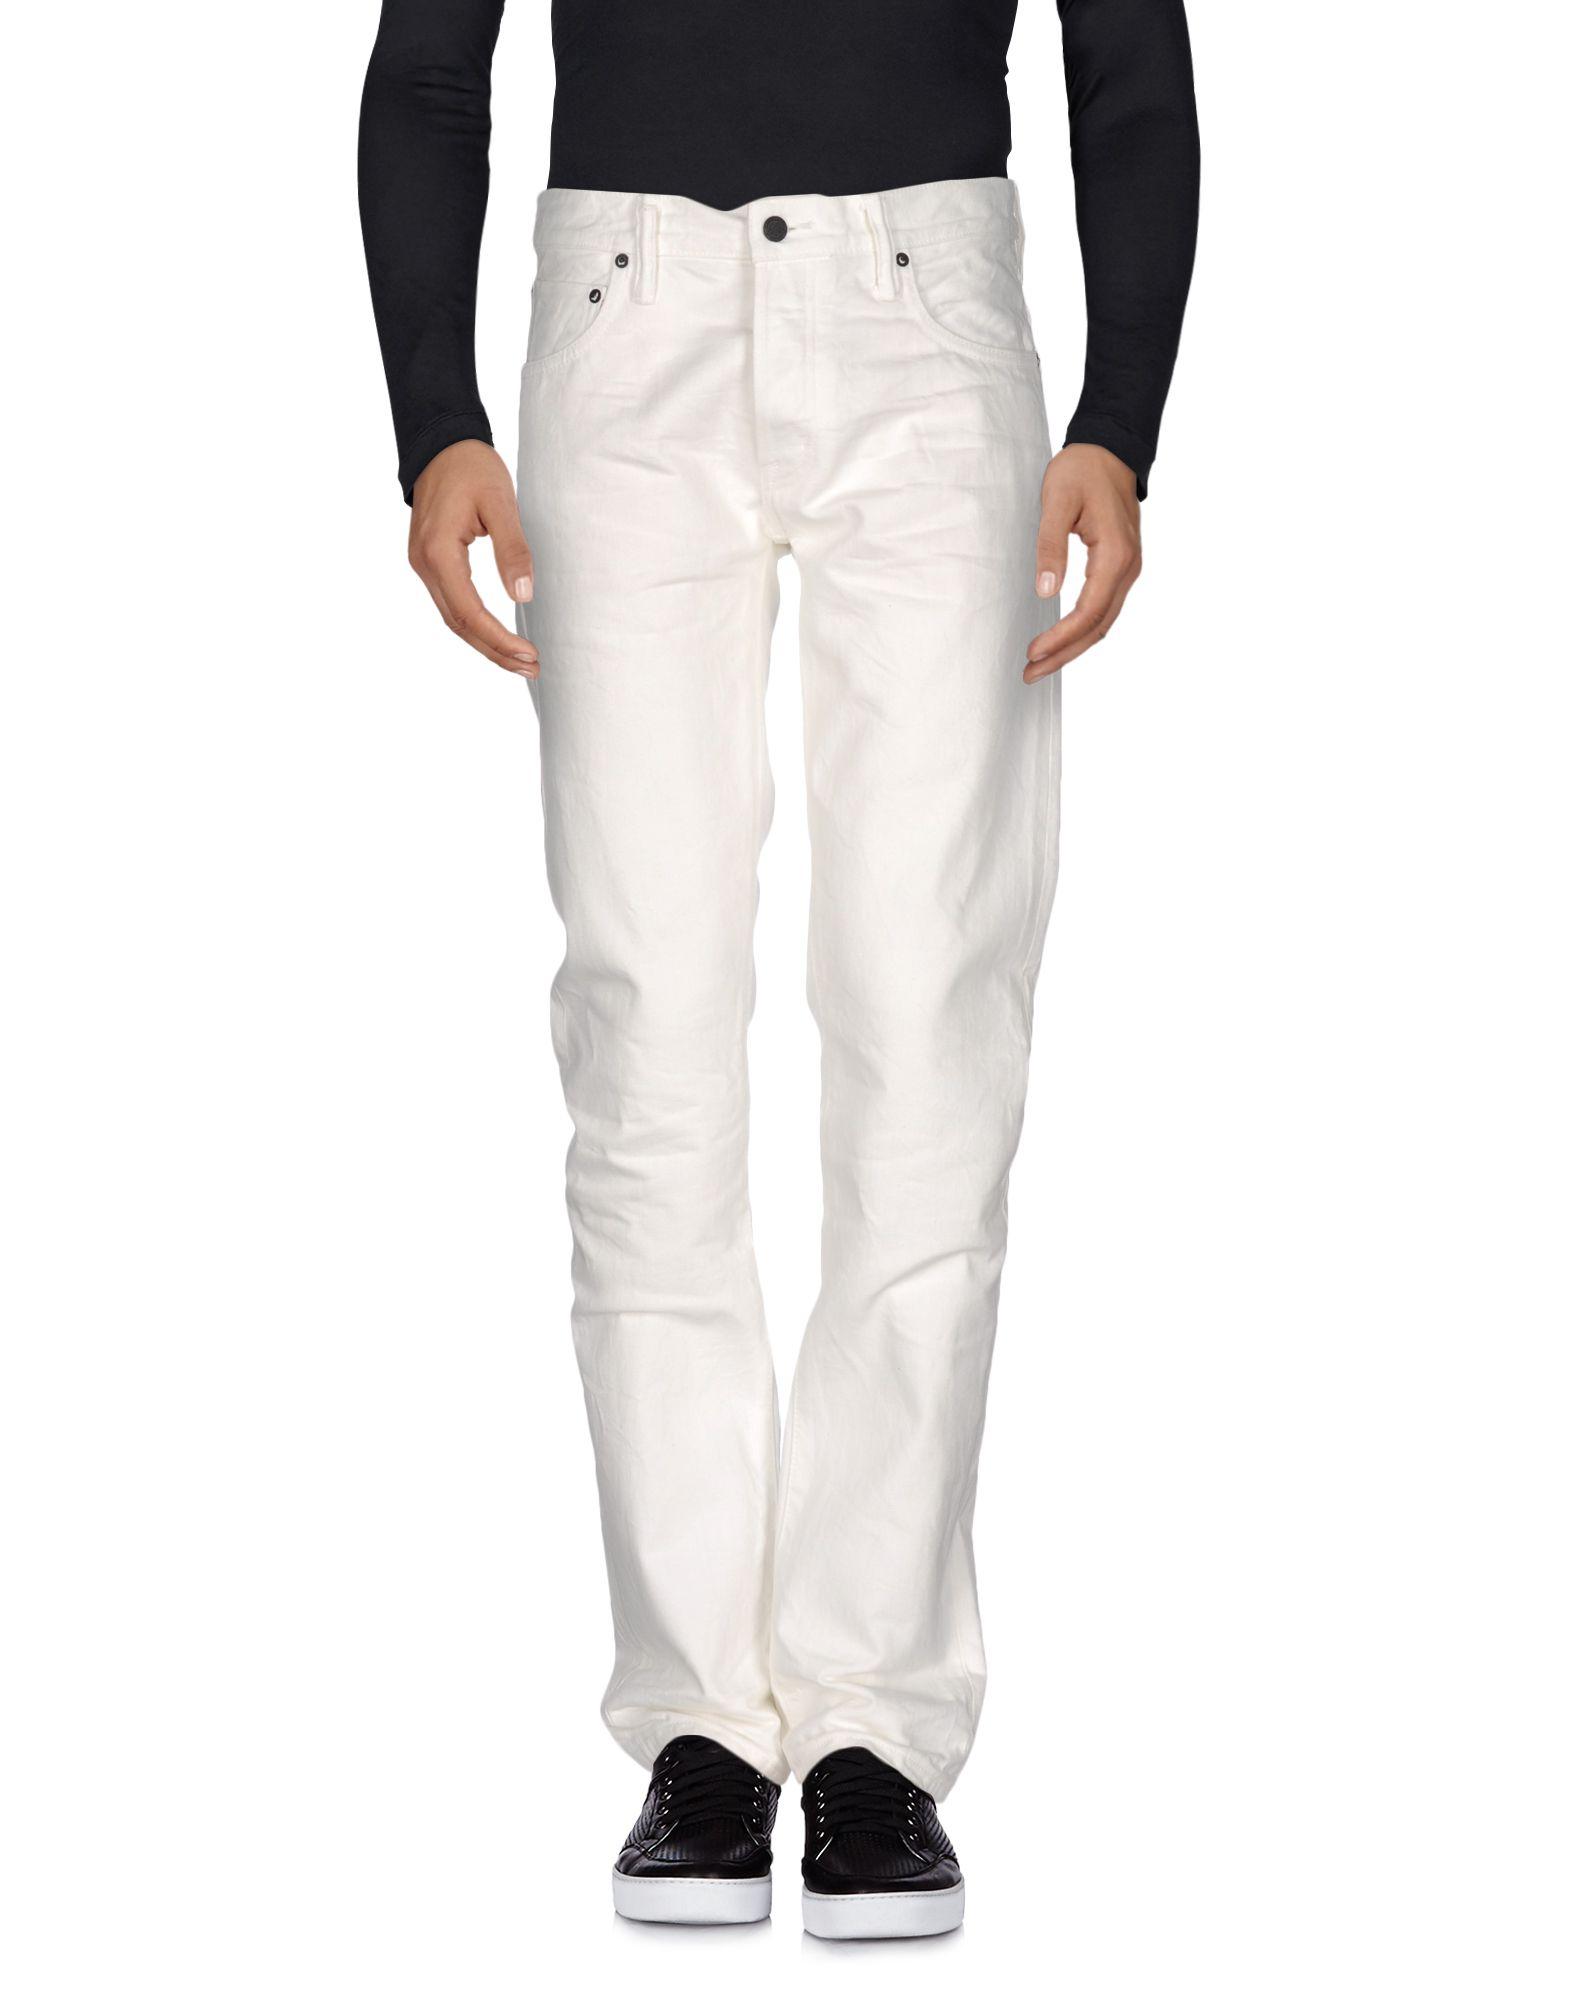 Pantaloni Jeans Mastercraft Union Uomo - Acquista online su